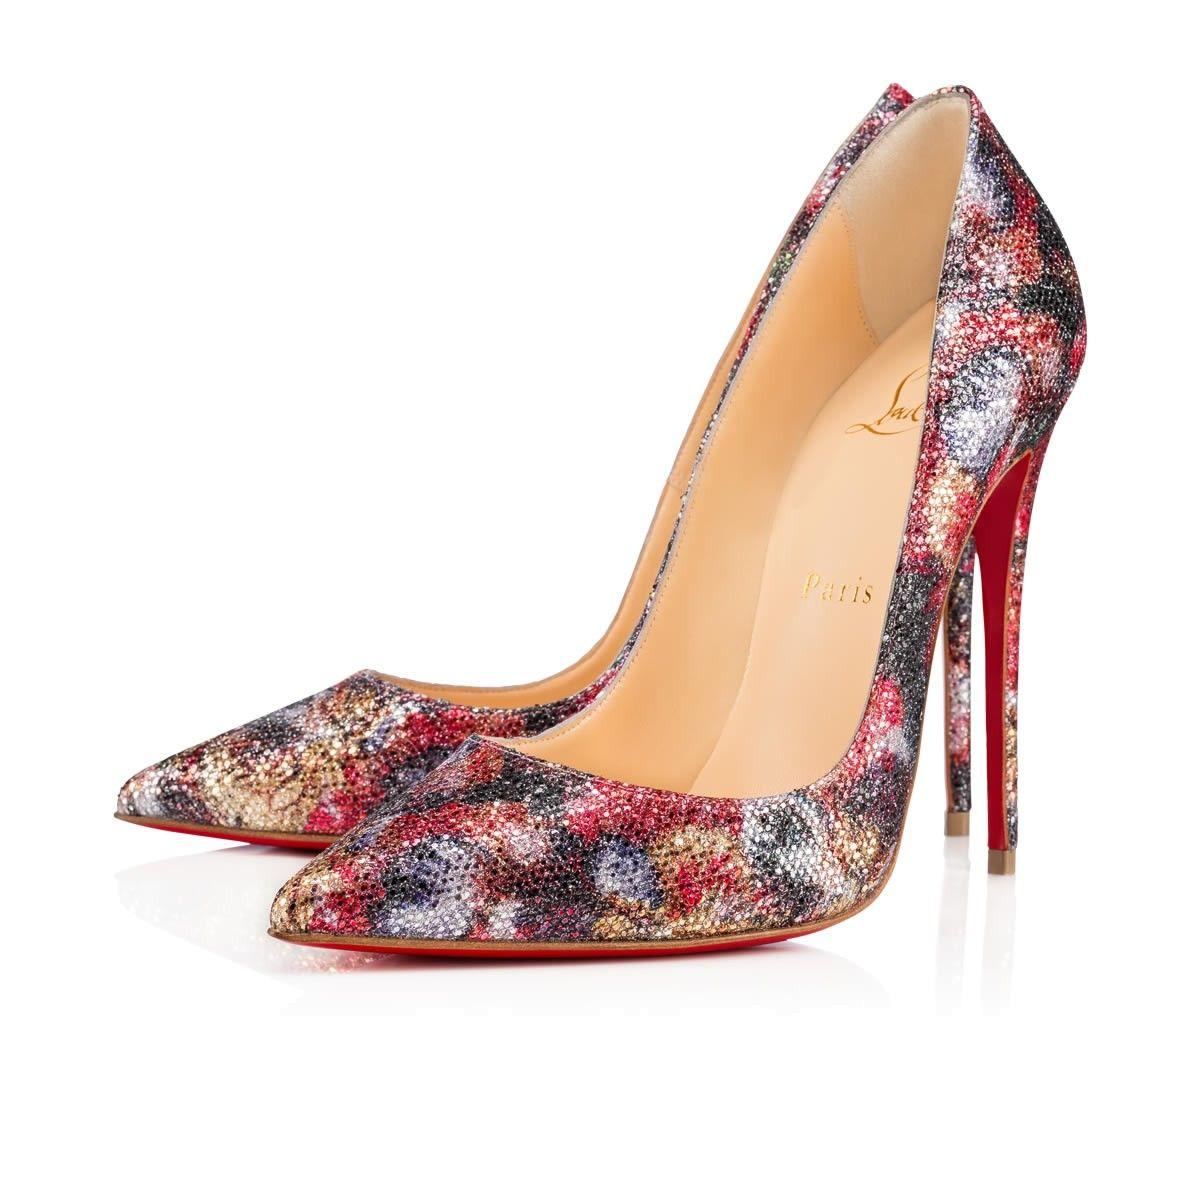 CHRISTIAN LOUBOUTIN So Kate 120 Multi Glitter - Women Shoes - Christian  Louboutin.  christianlouboutin  shoes   f8b2ab0c48